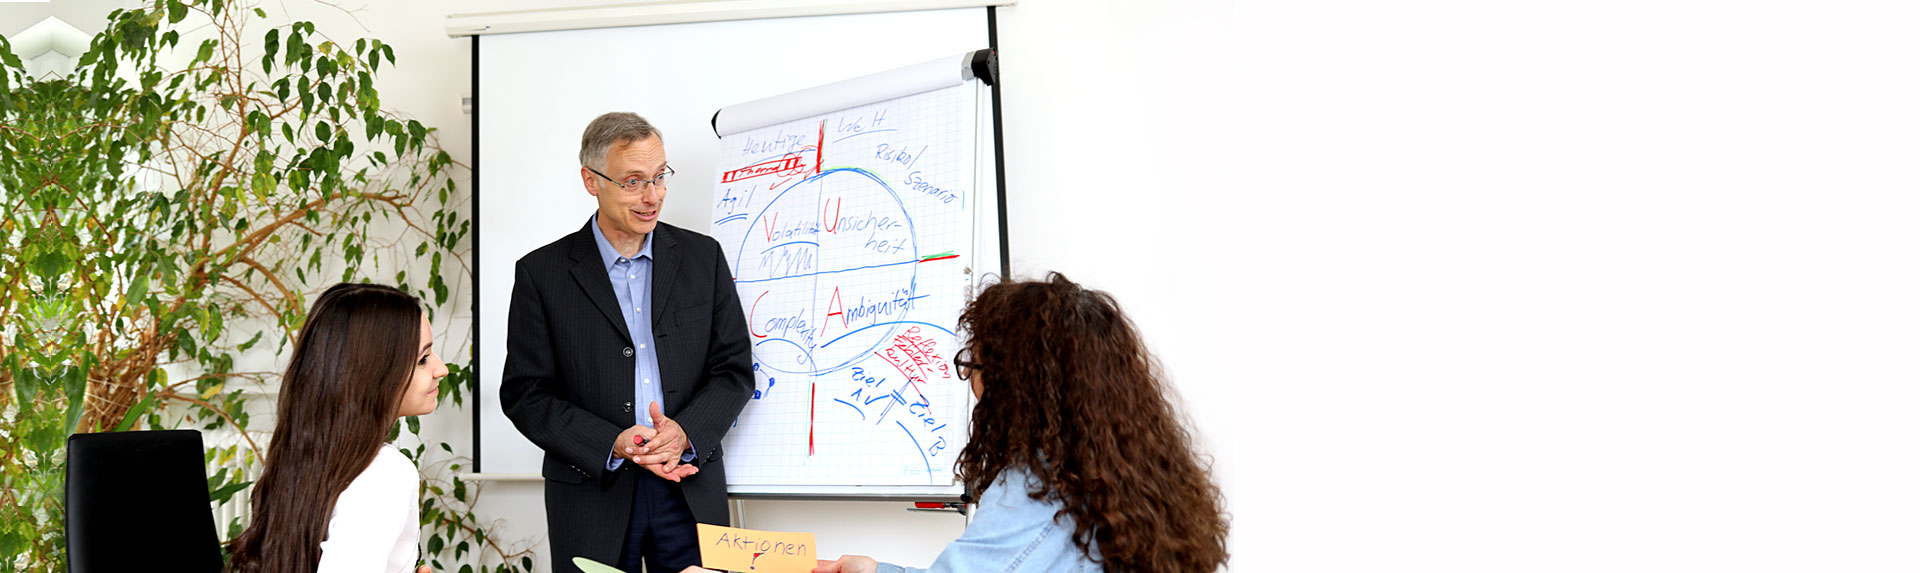 Team-Coaching mit Prof. Dr. Ulrich Lenz